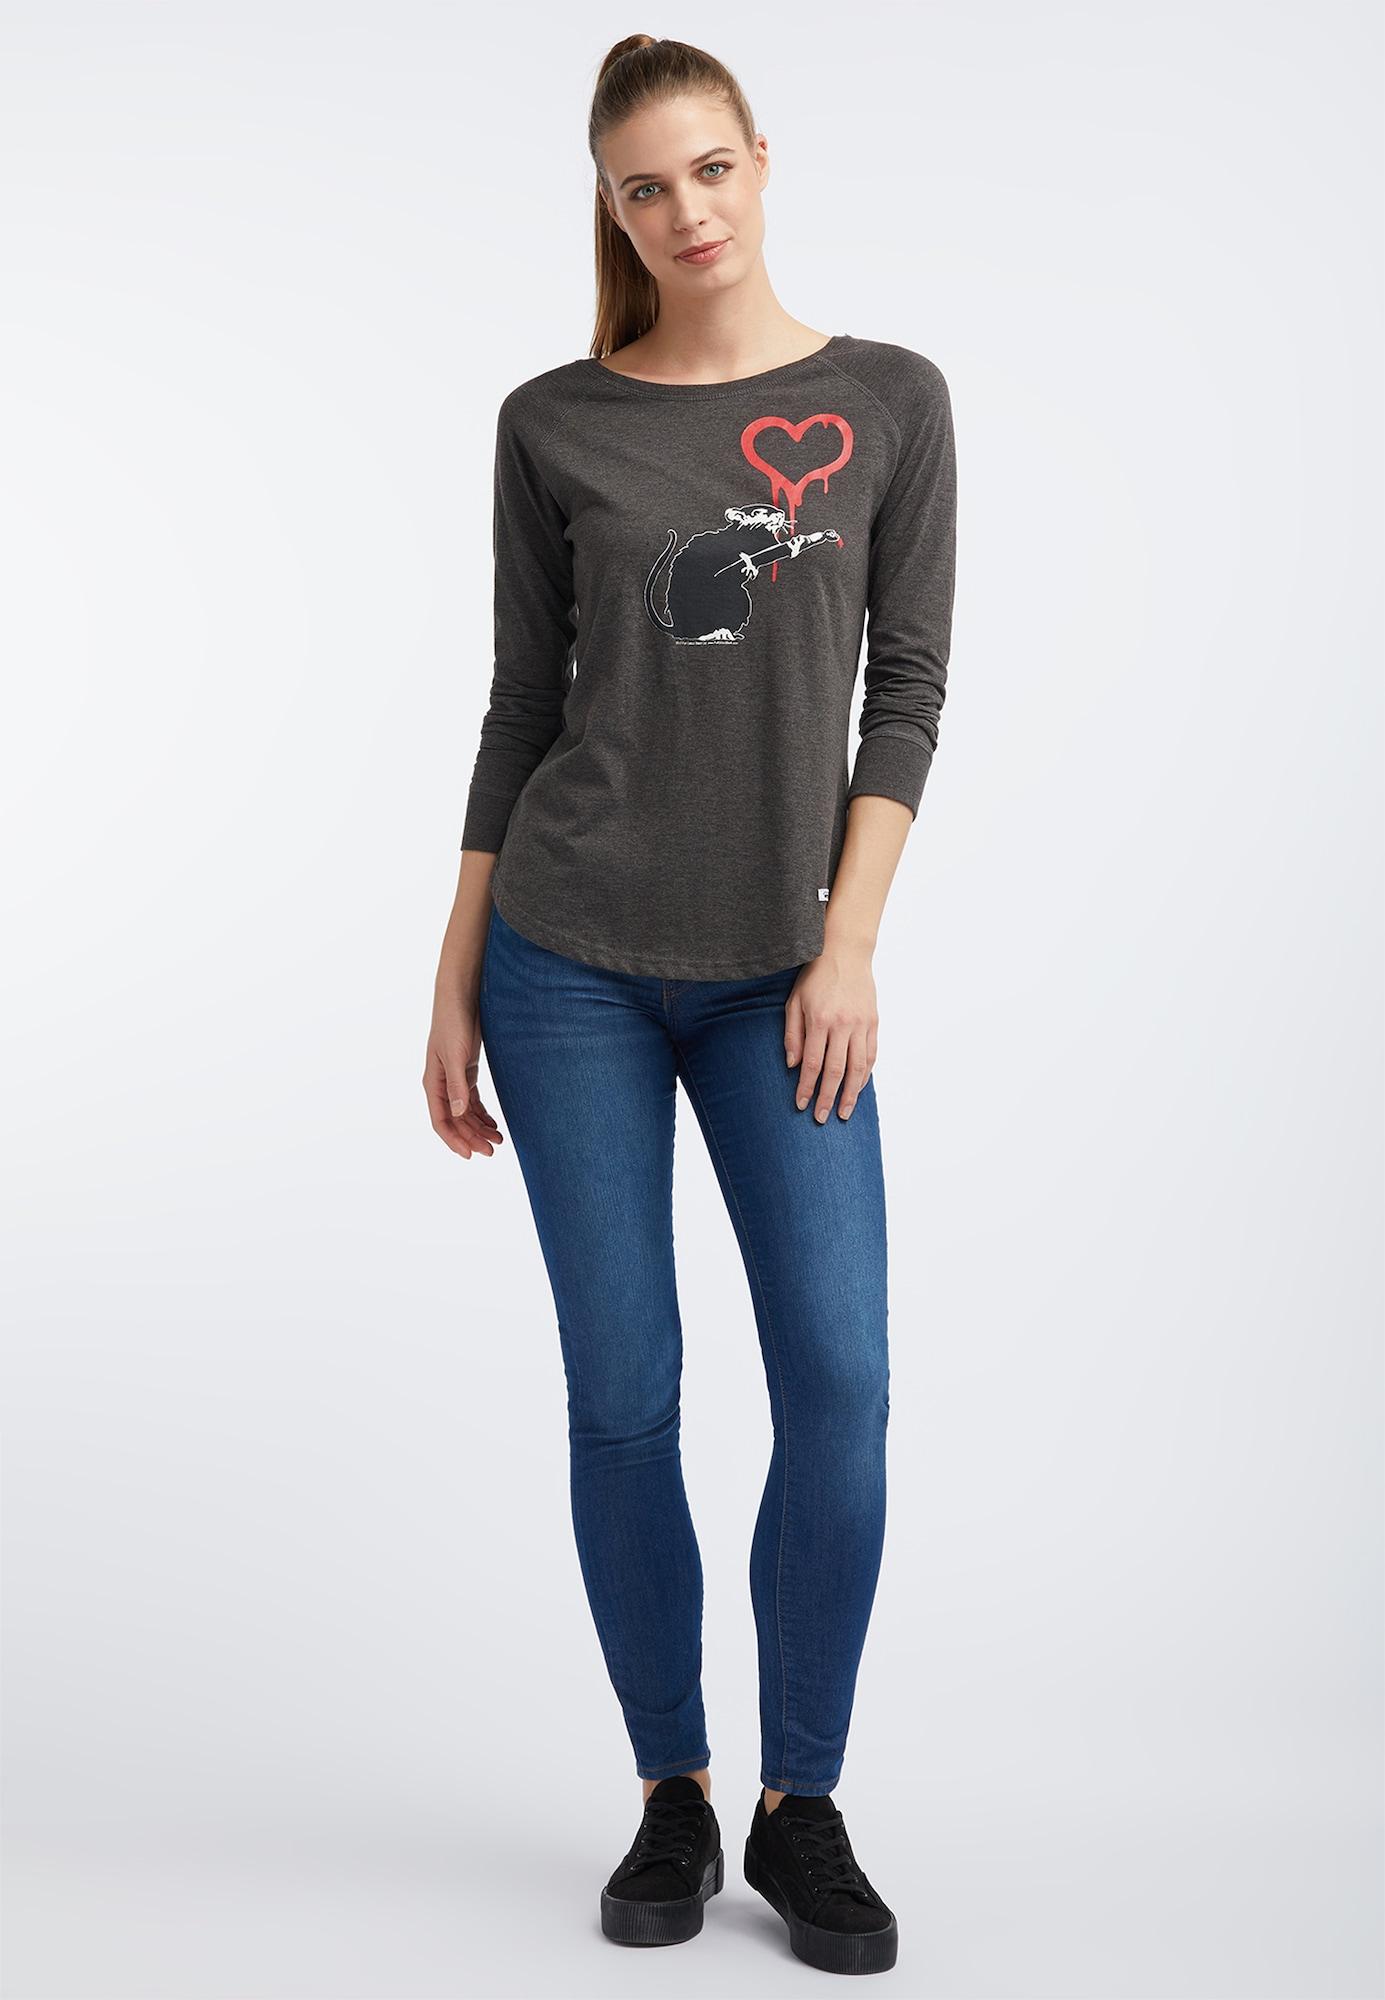 HOMEBASE, Damen Shirt, antraciet / donkergrijs / rood / wit